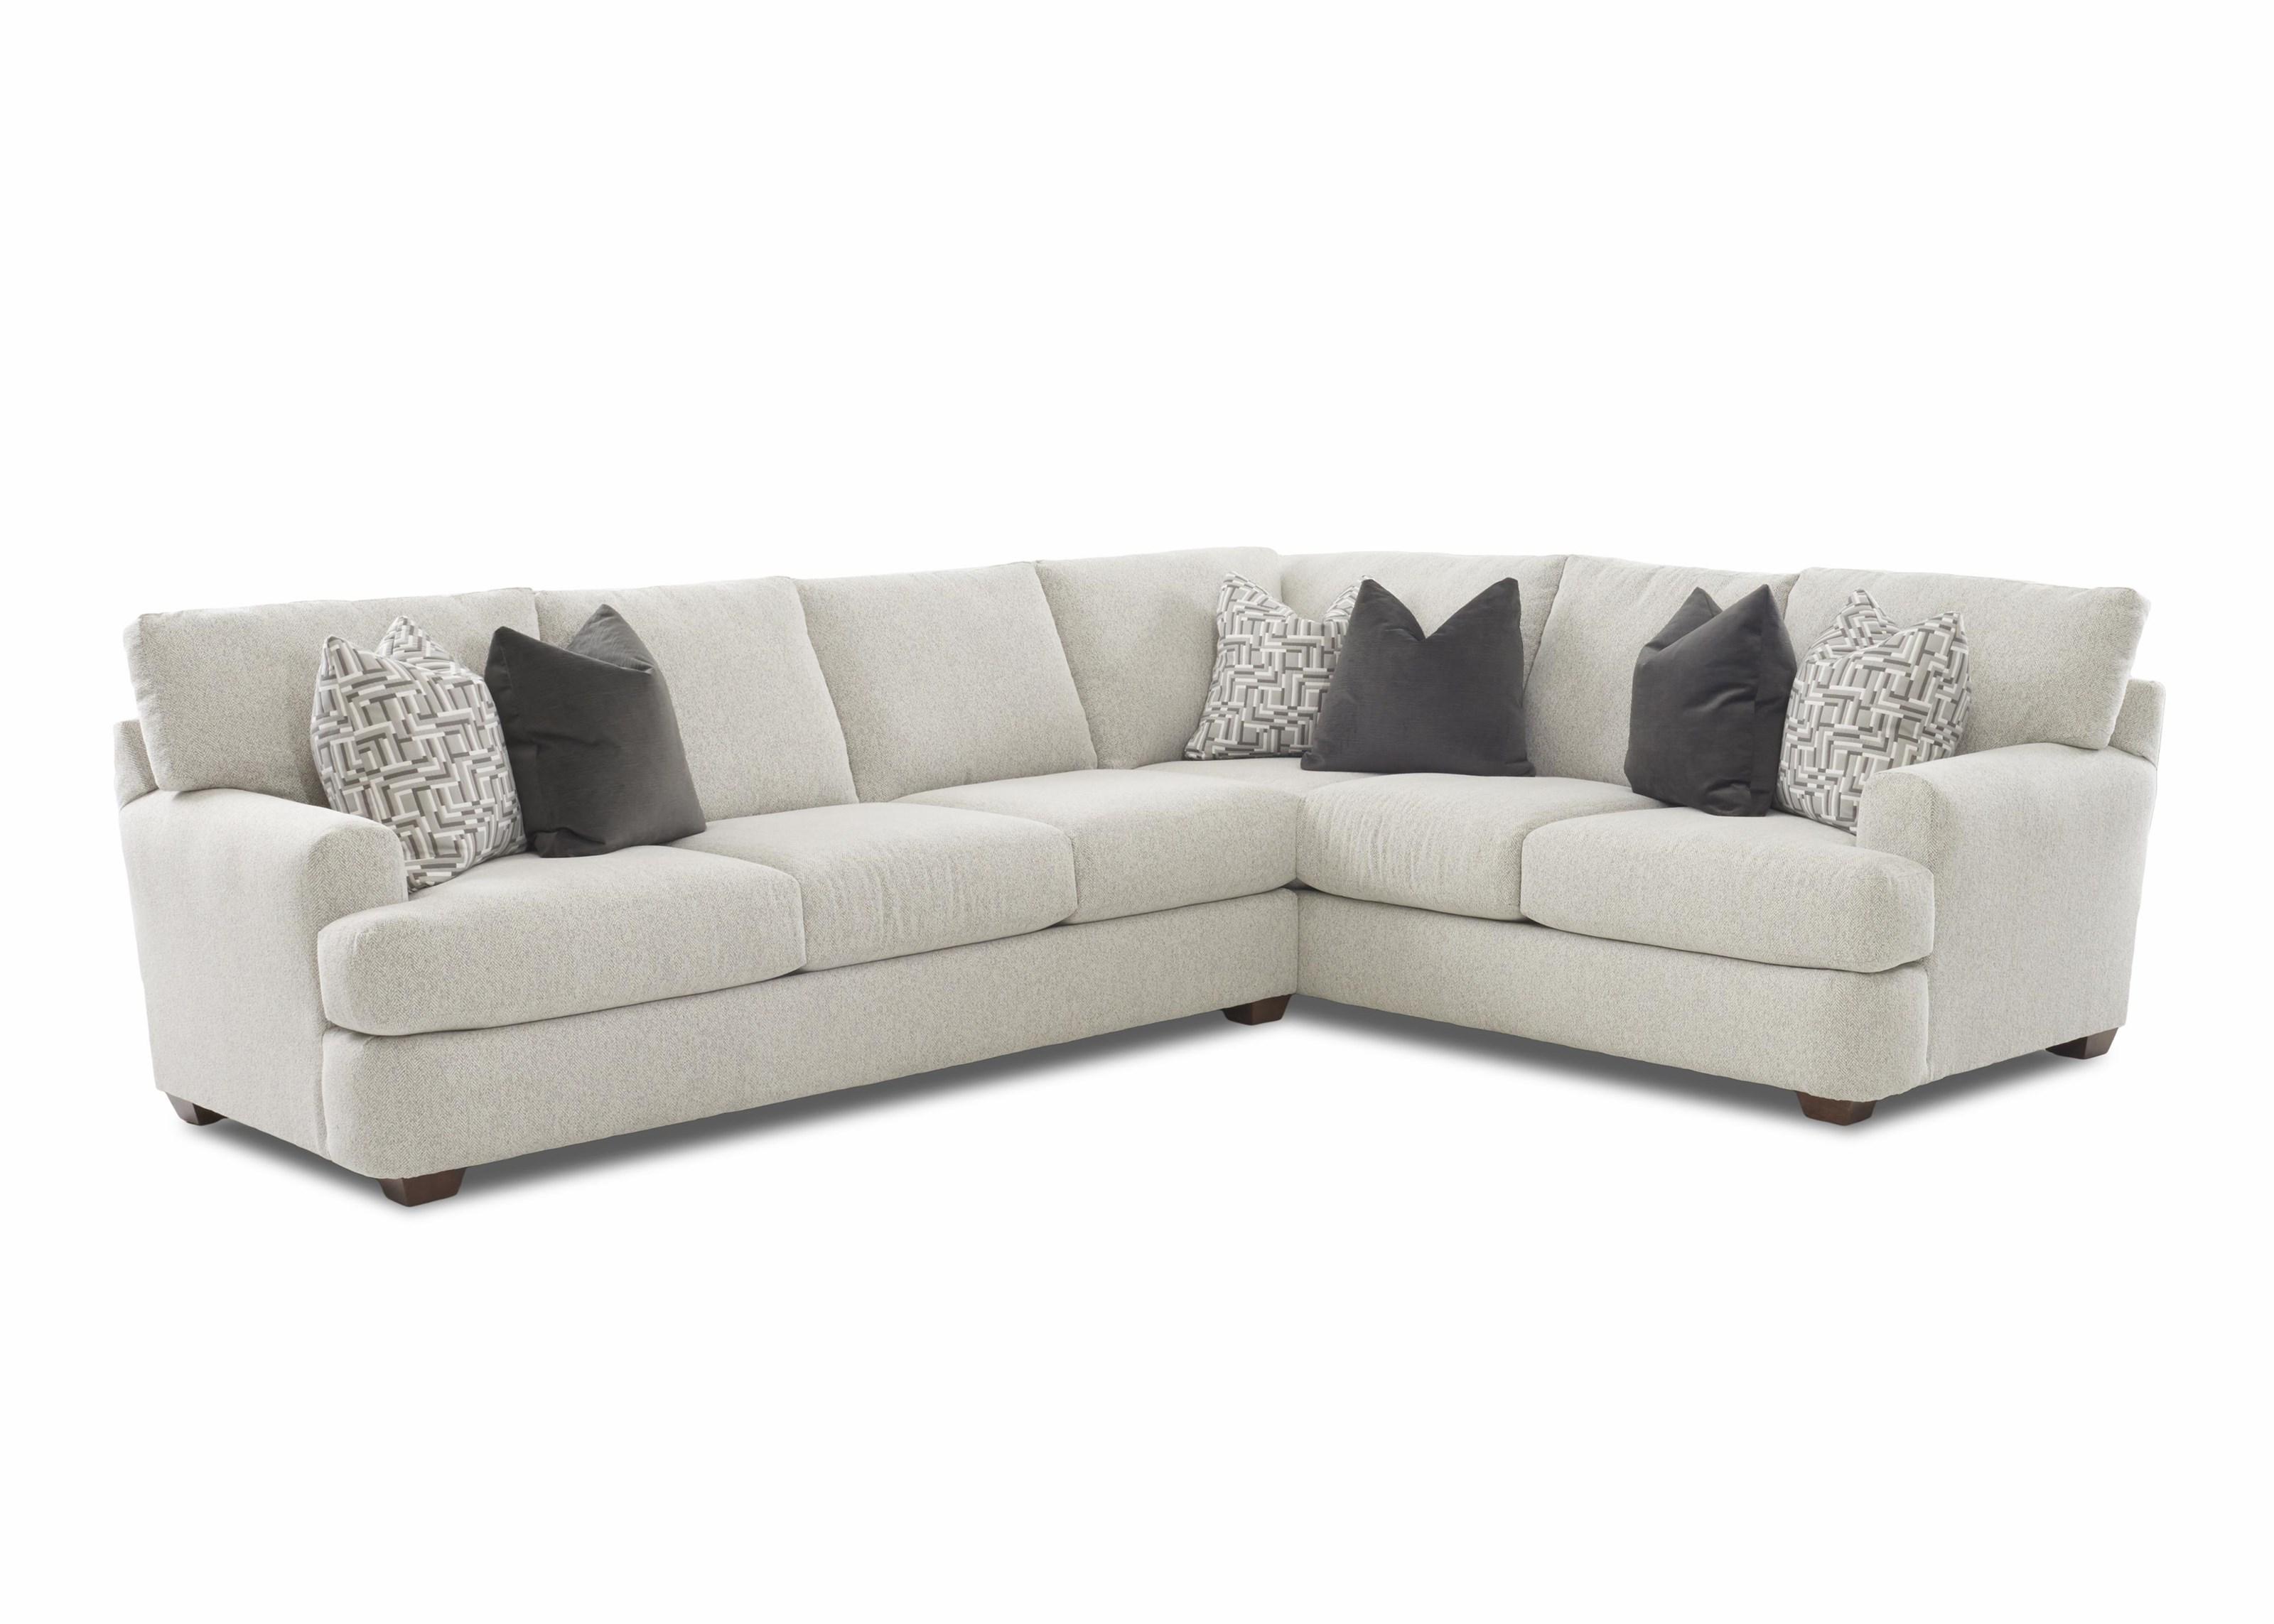 emma tufted sofa craigslist tulsa sofas klausner klaussner home furnishings asheboro nc thesofa